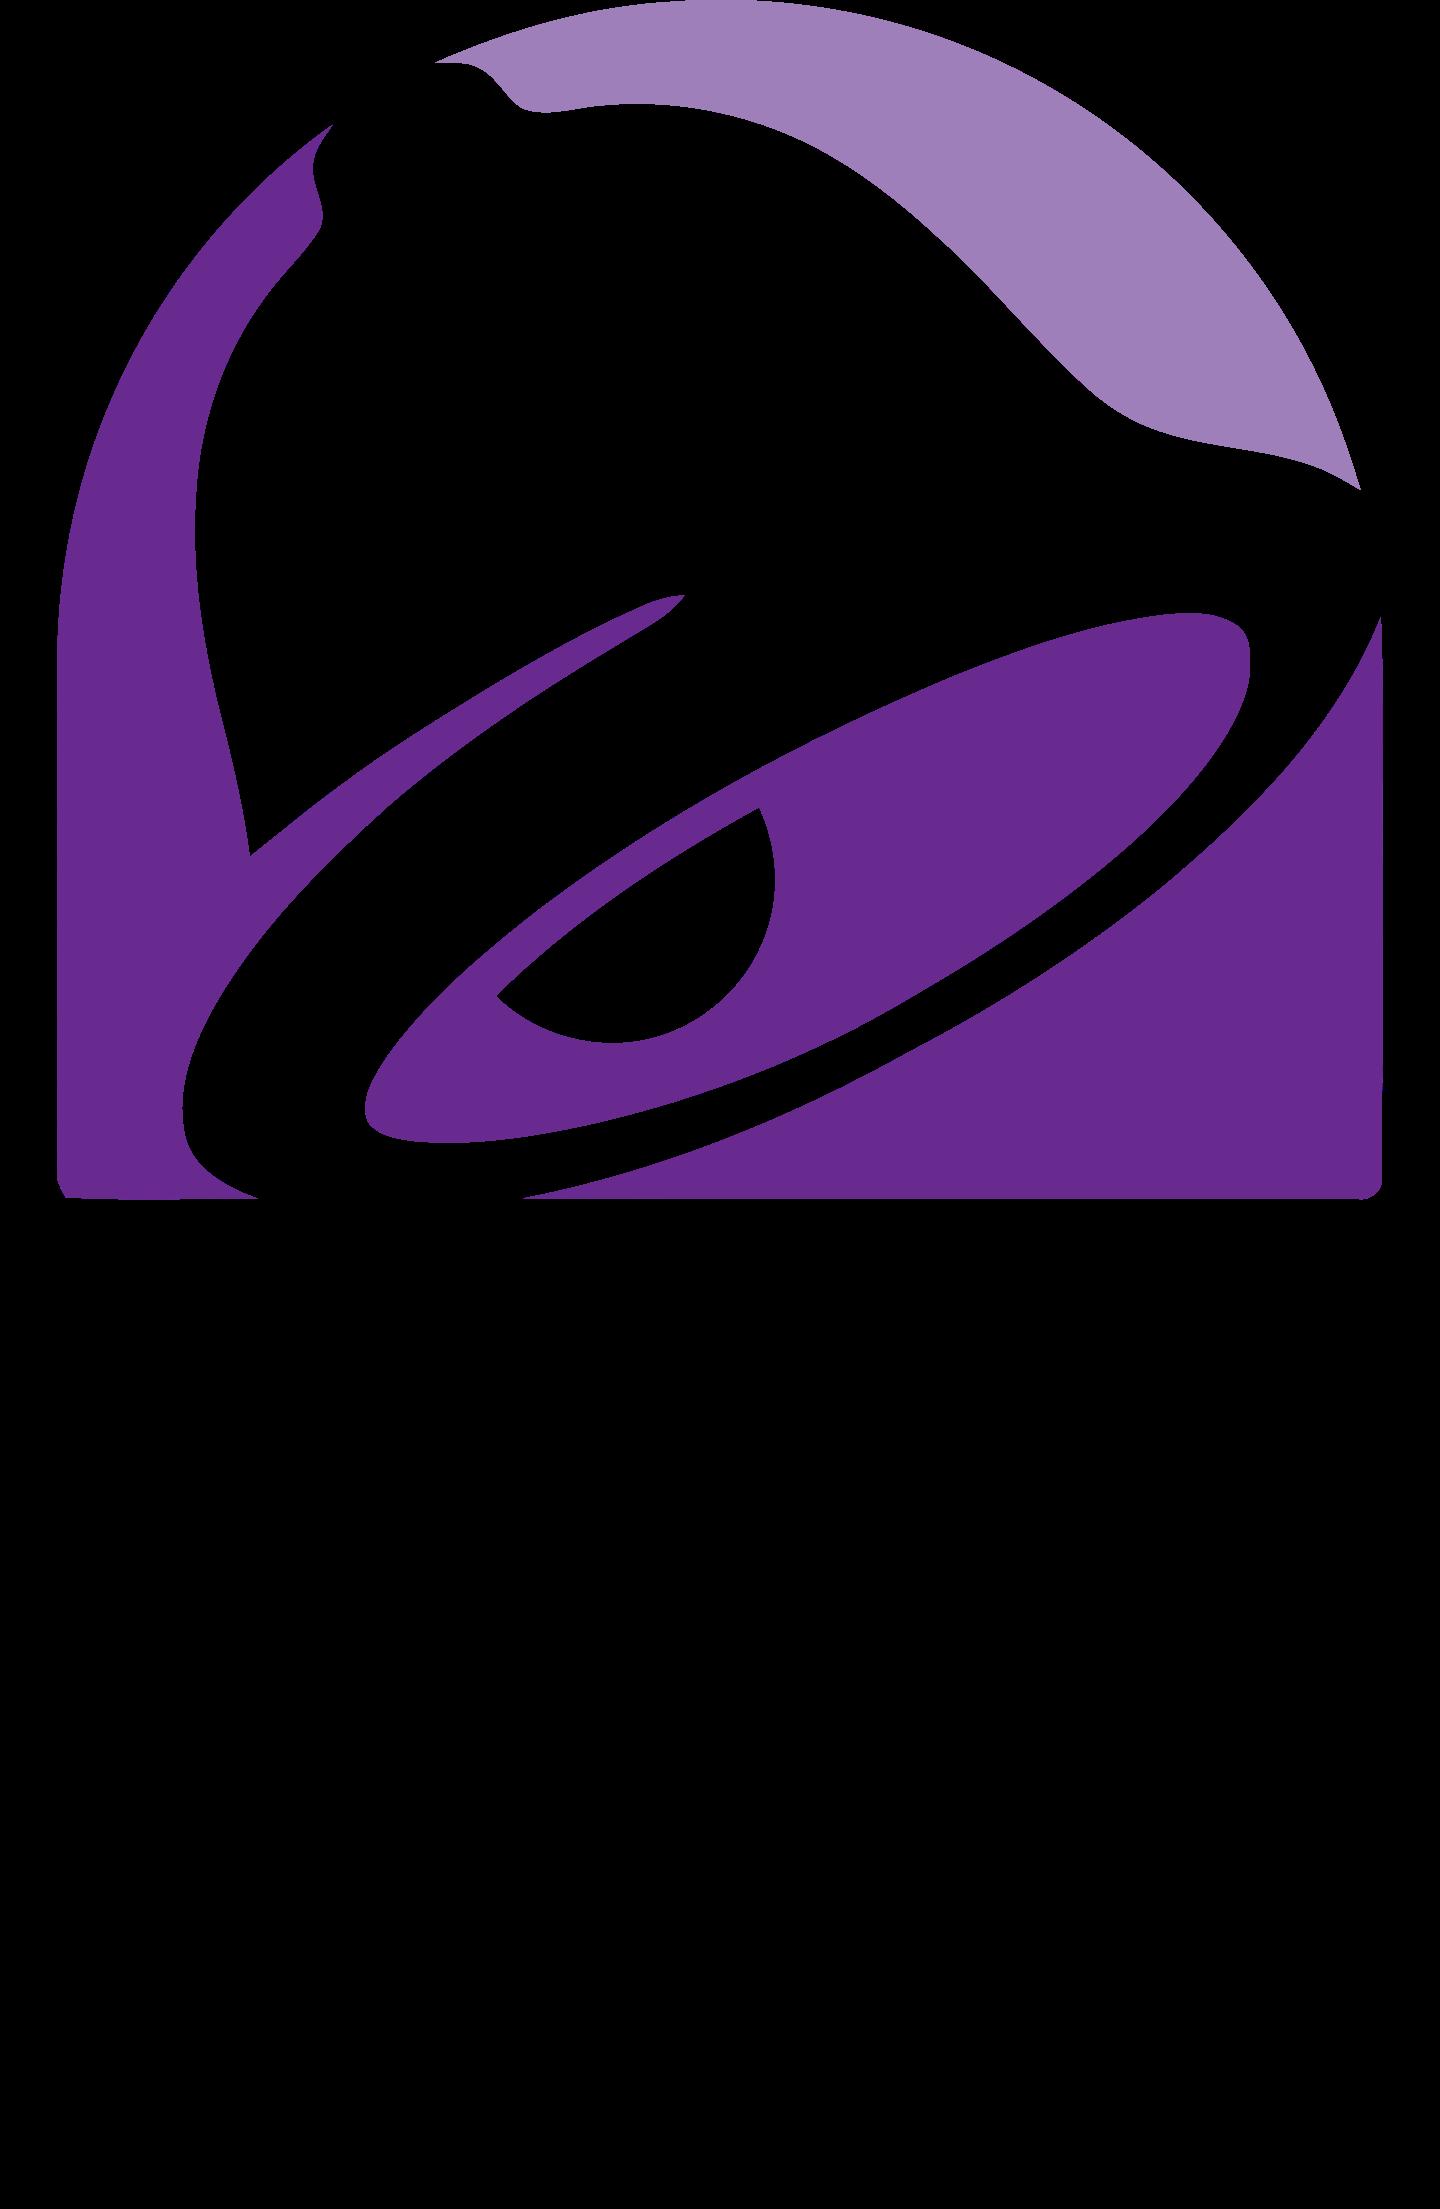 taco bell logo 2 - Taco Bell Logo